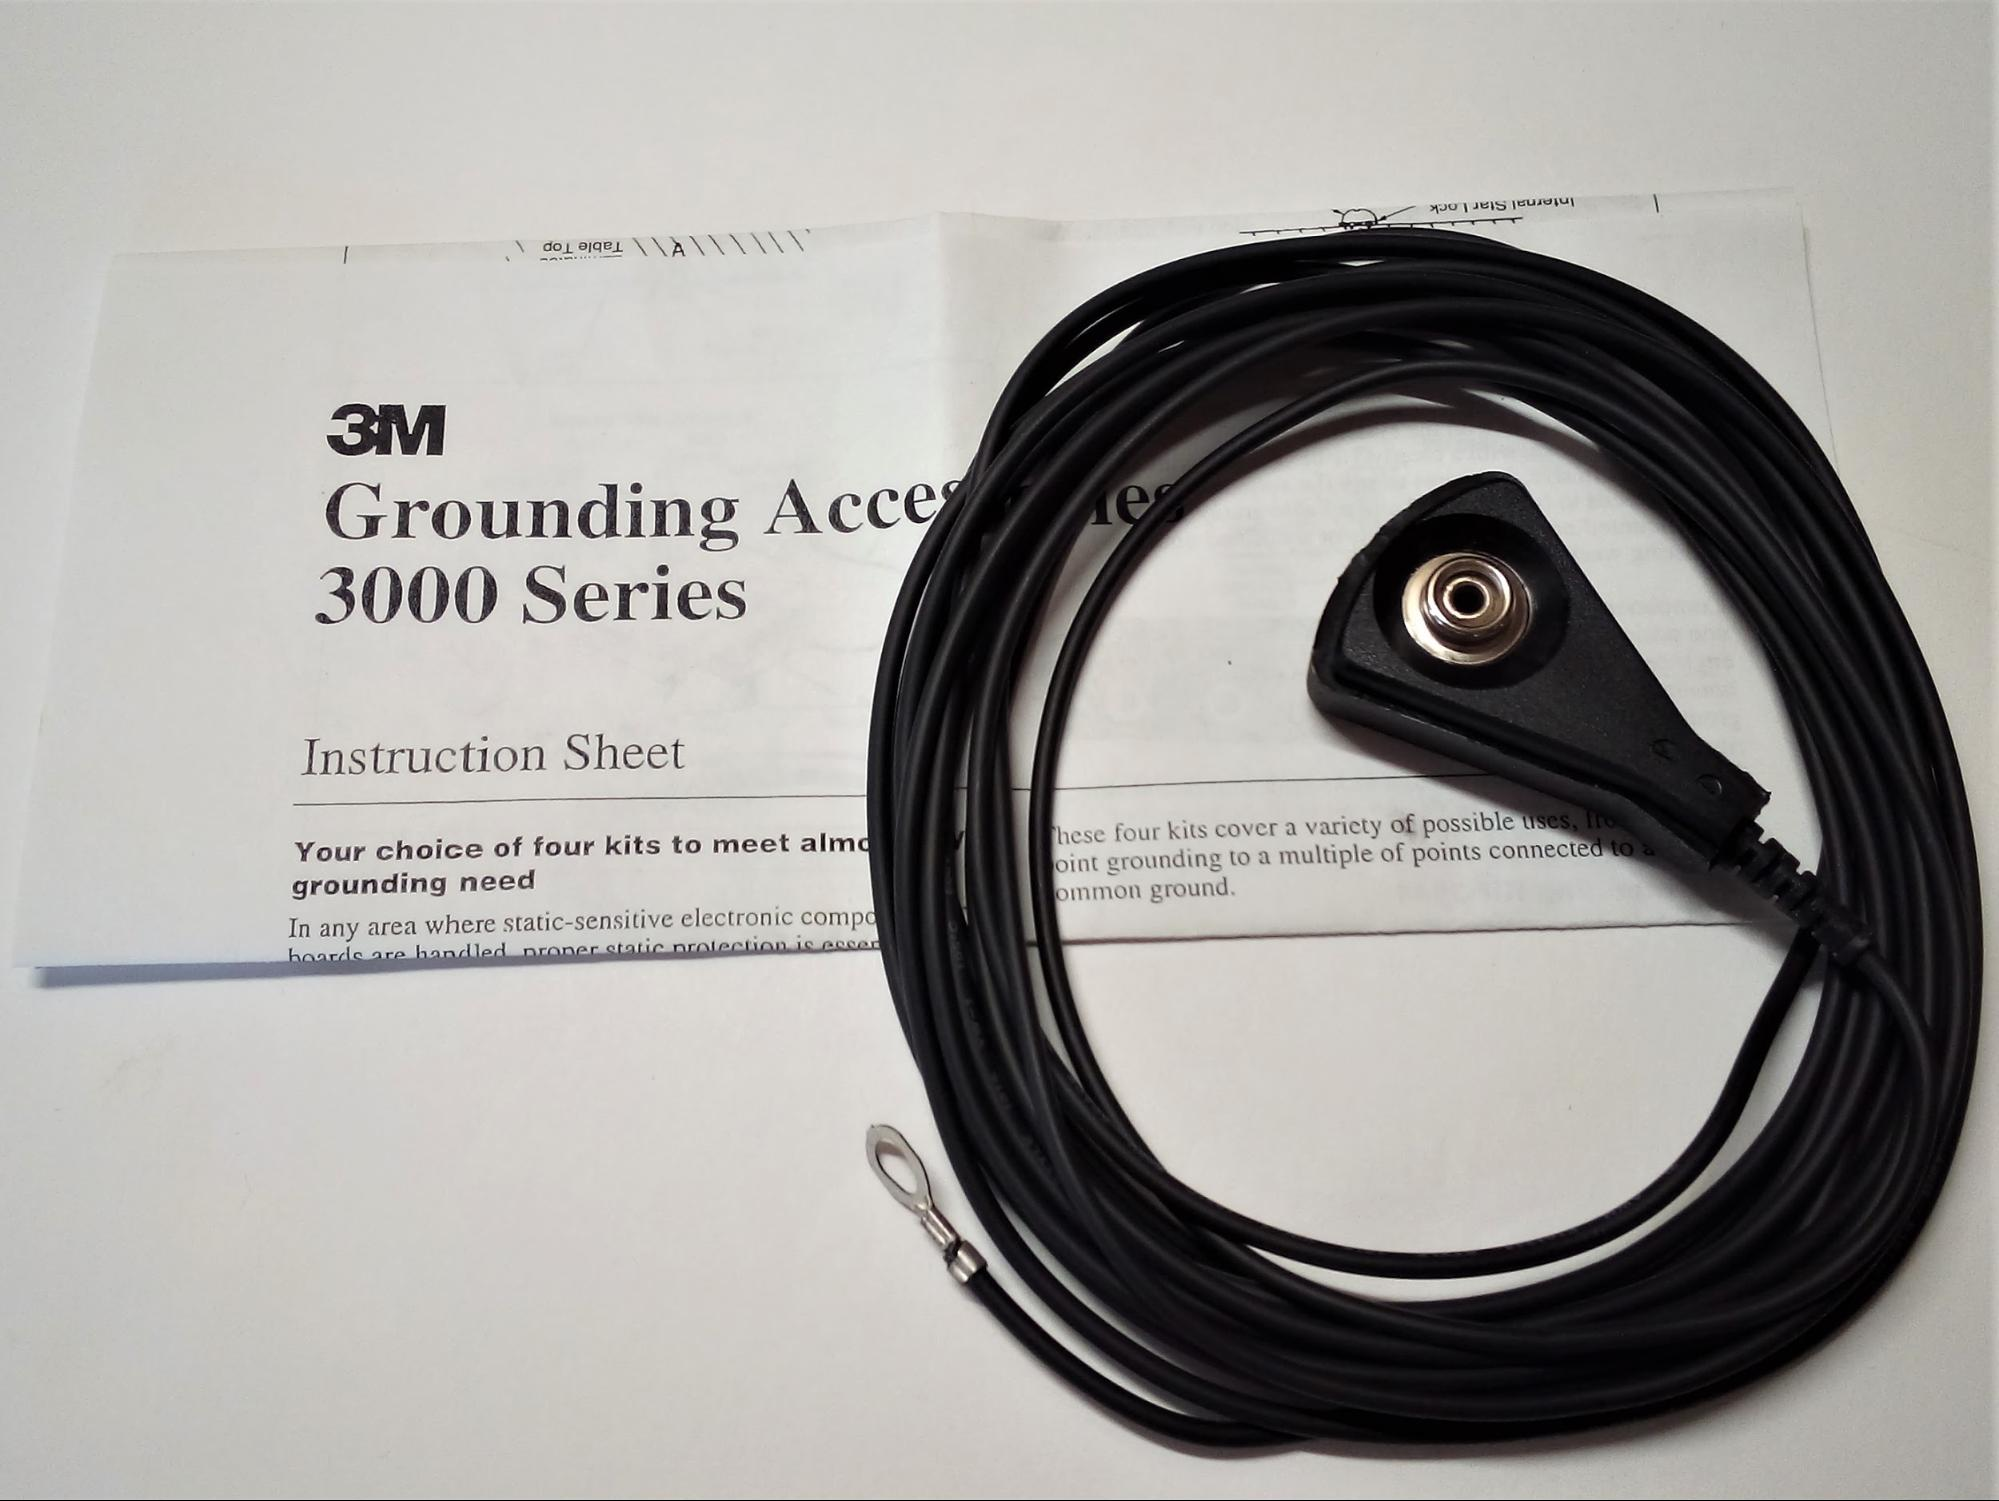 grounding wrist strap